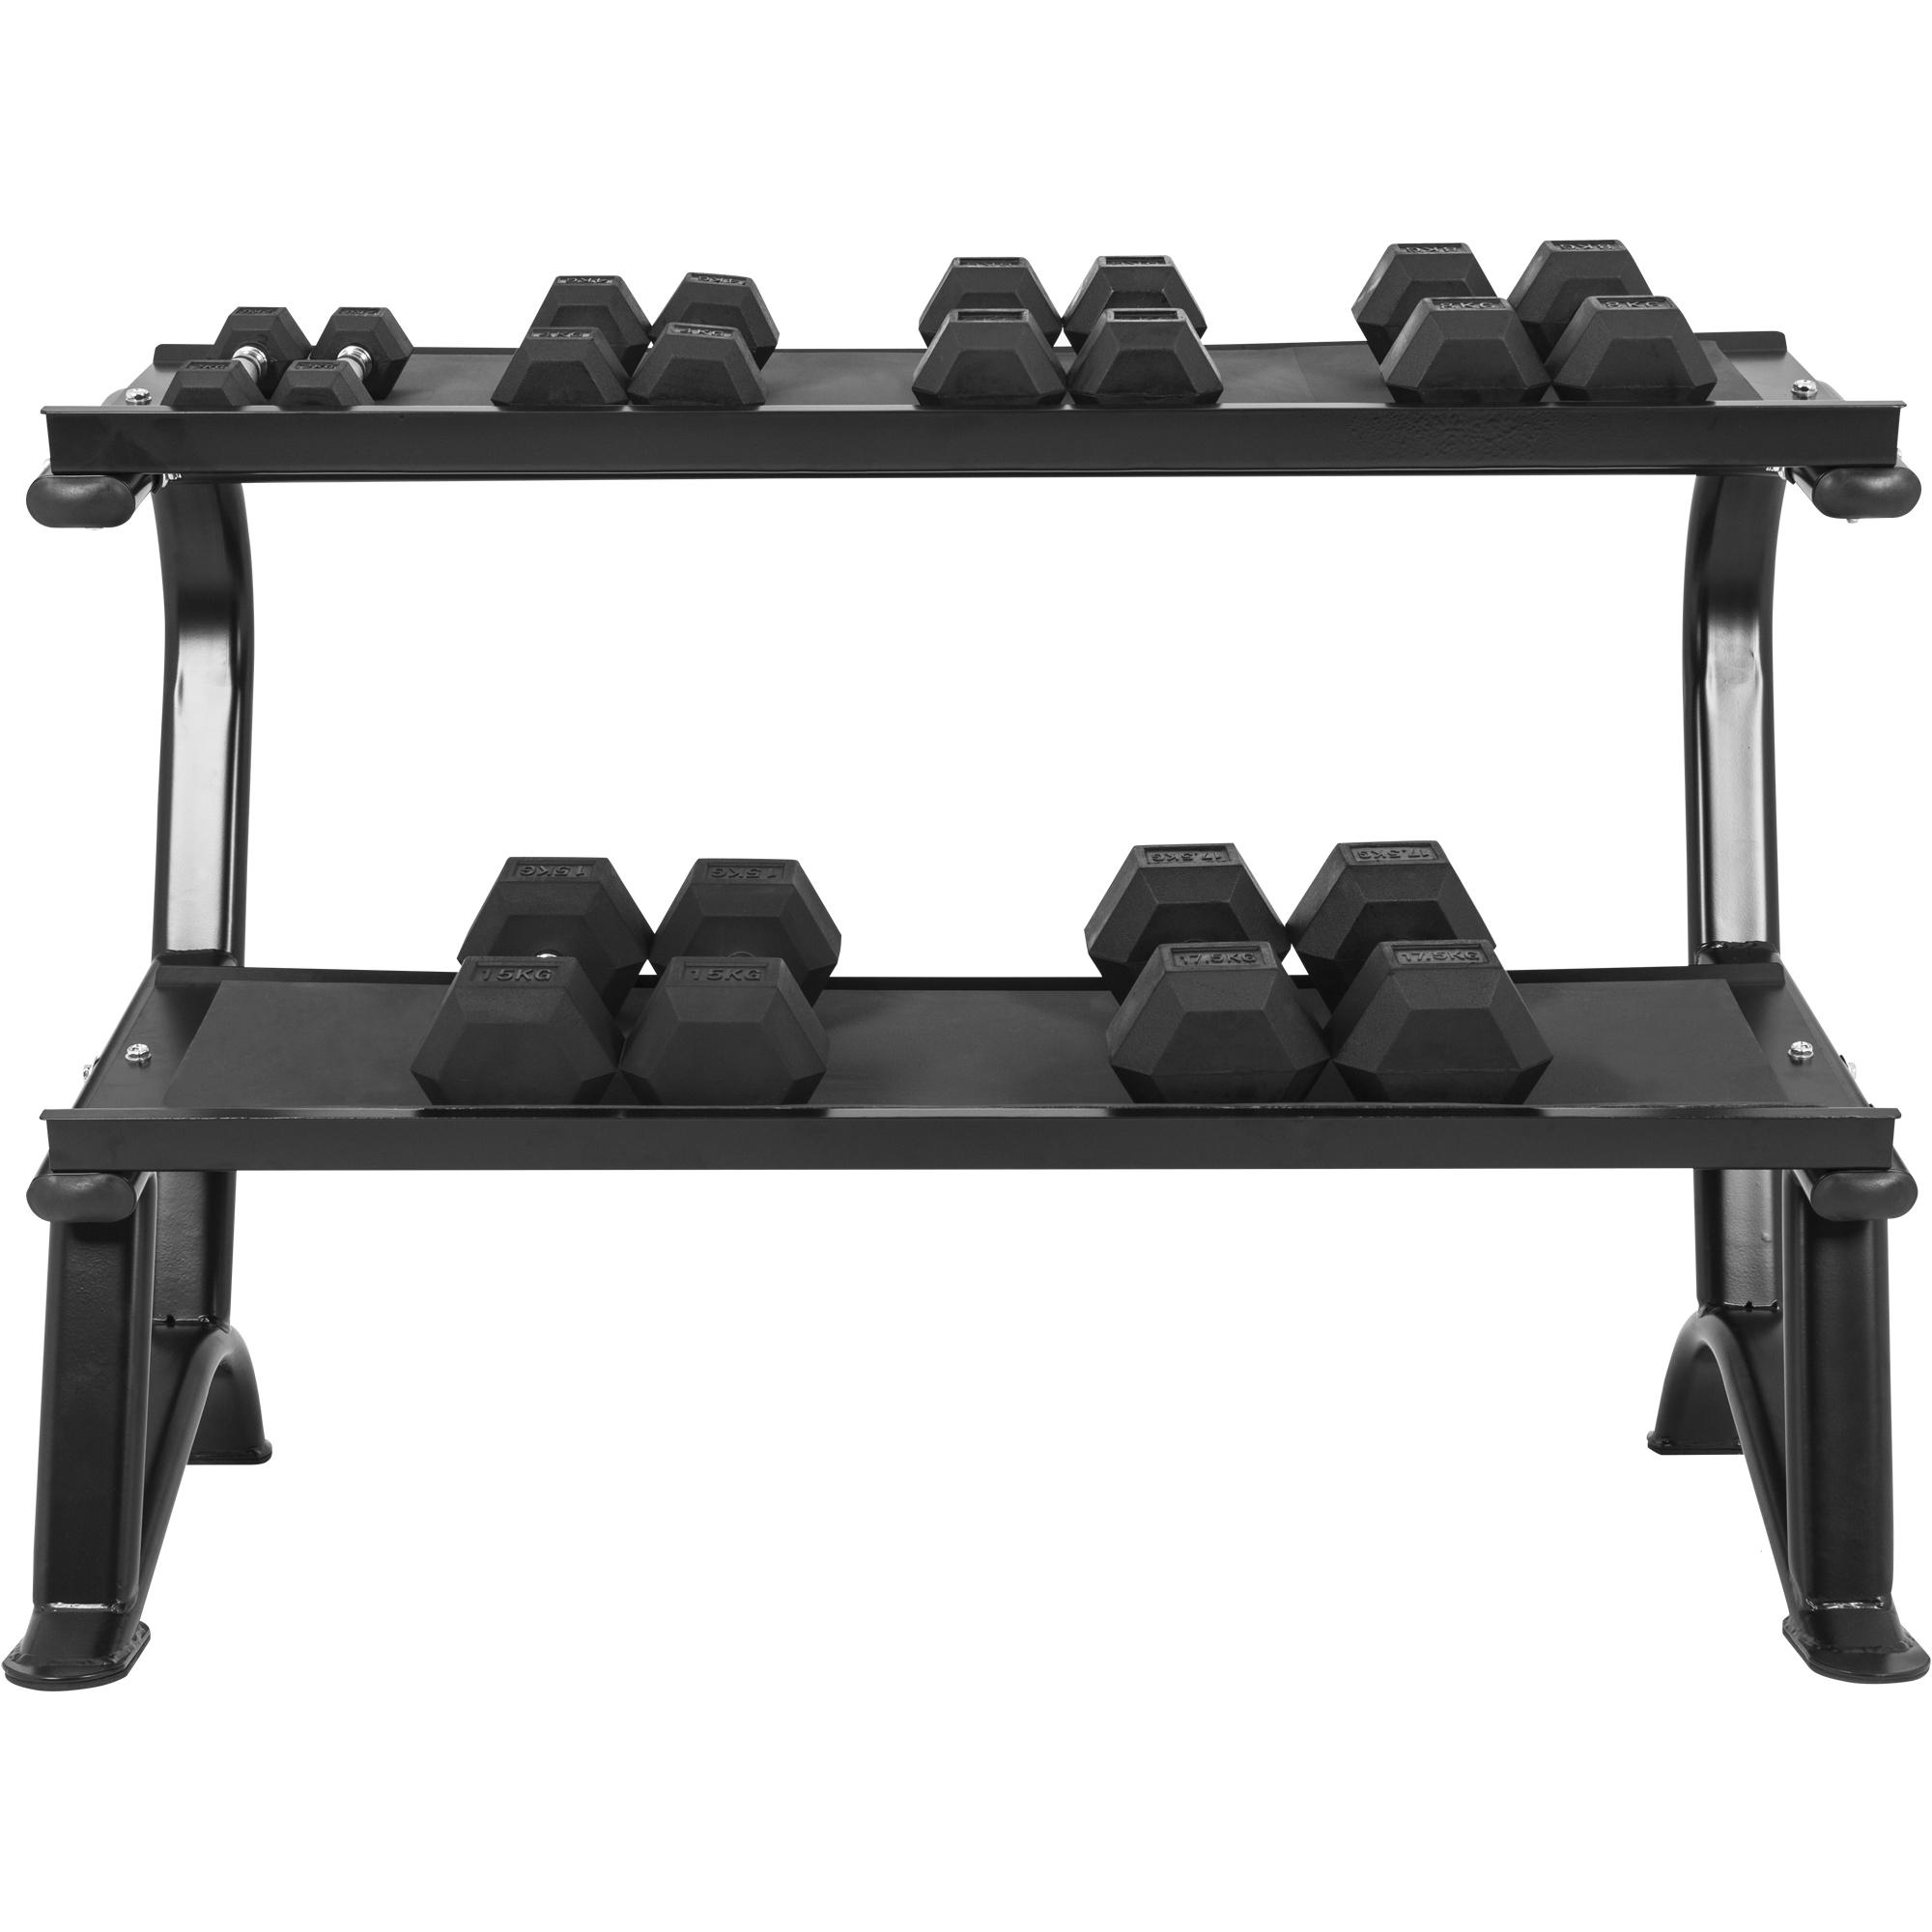 rack de rangement pour halt res hexagonales 10000798. Black Bedroom Furniture Sets. Home Design Ideas